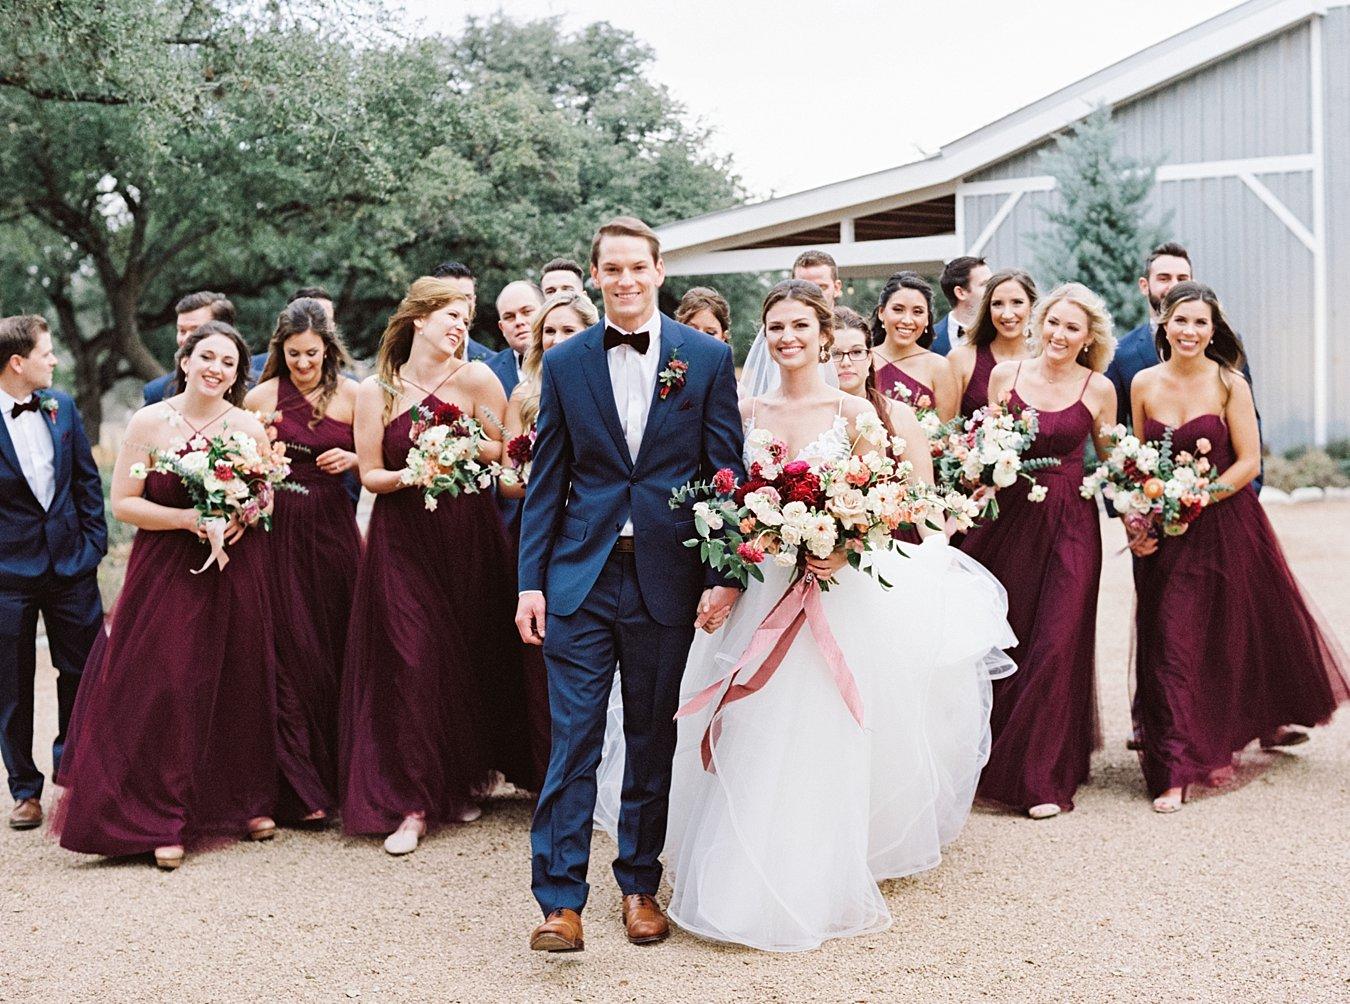 Addison-Grove-Wedding-Photos-Dripping-Springs-TX-13-2.jpg